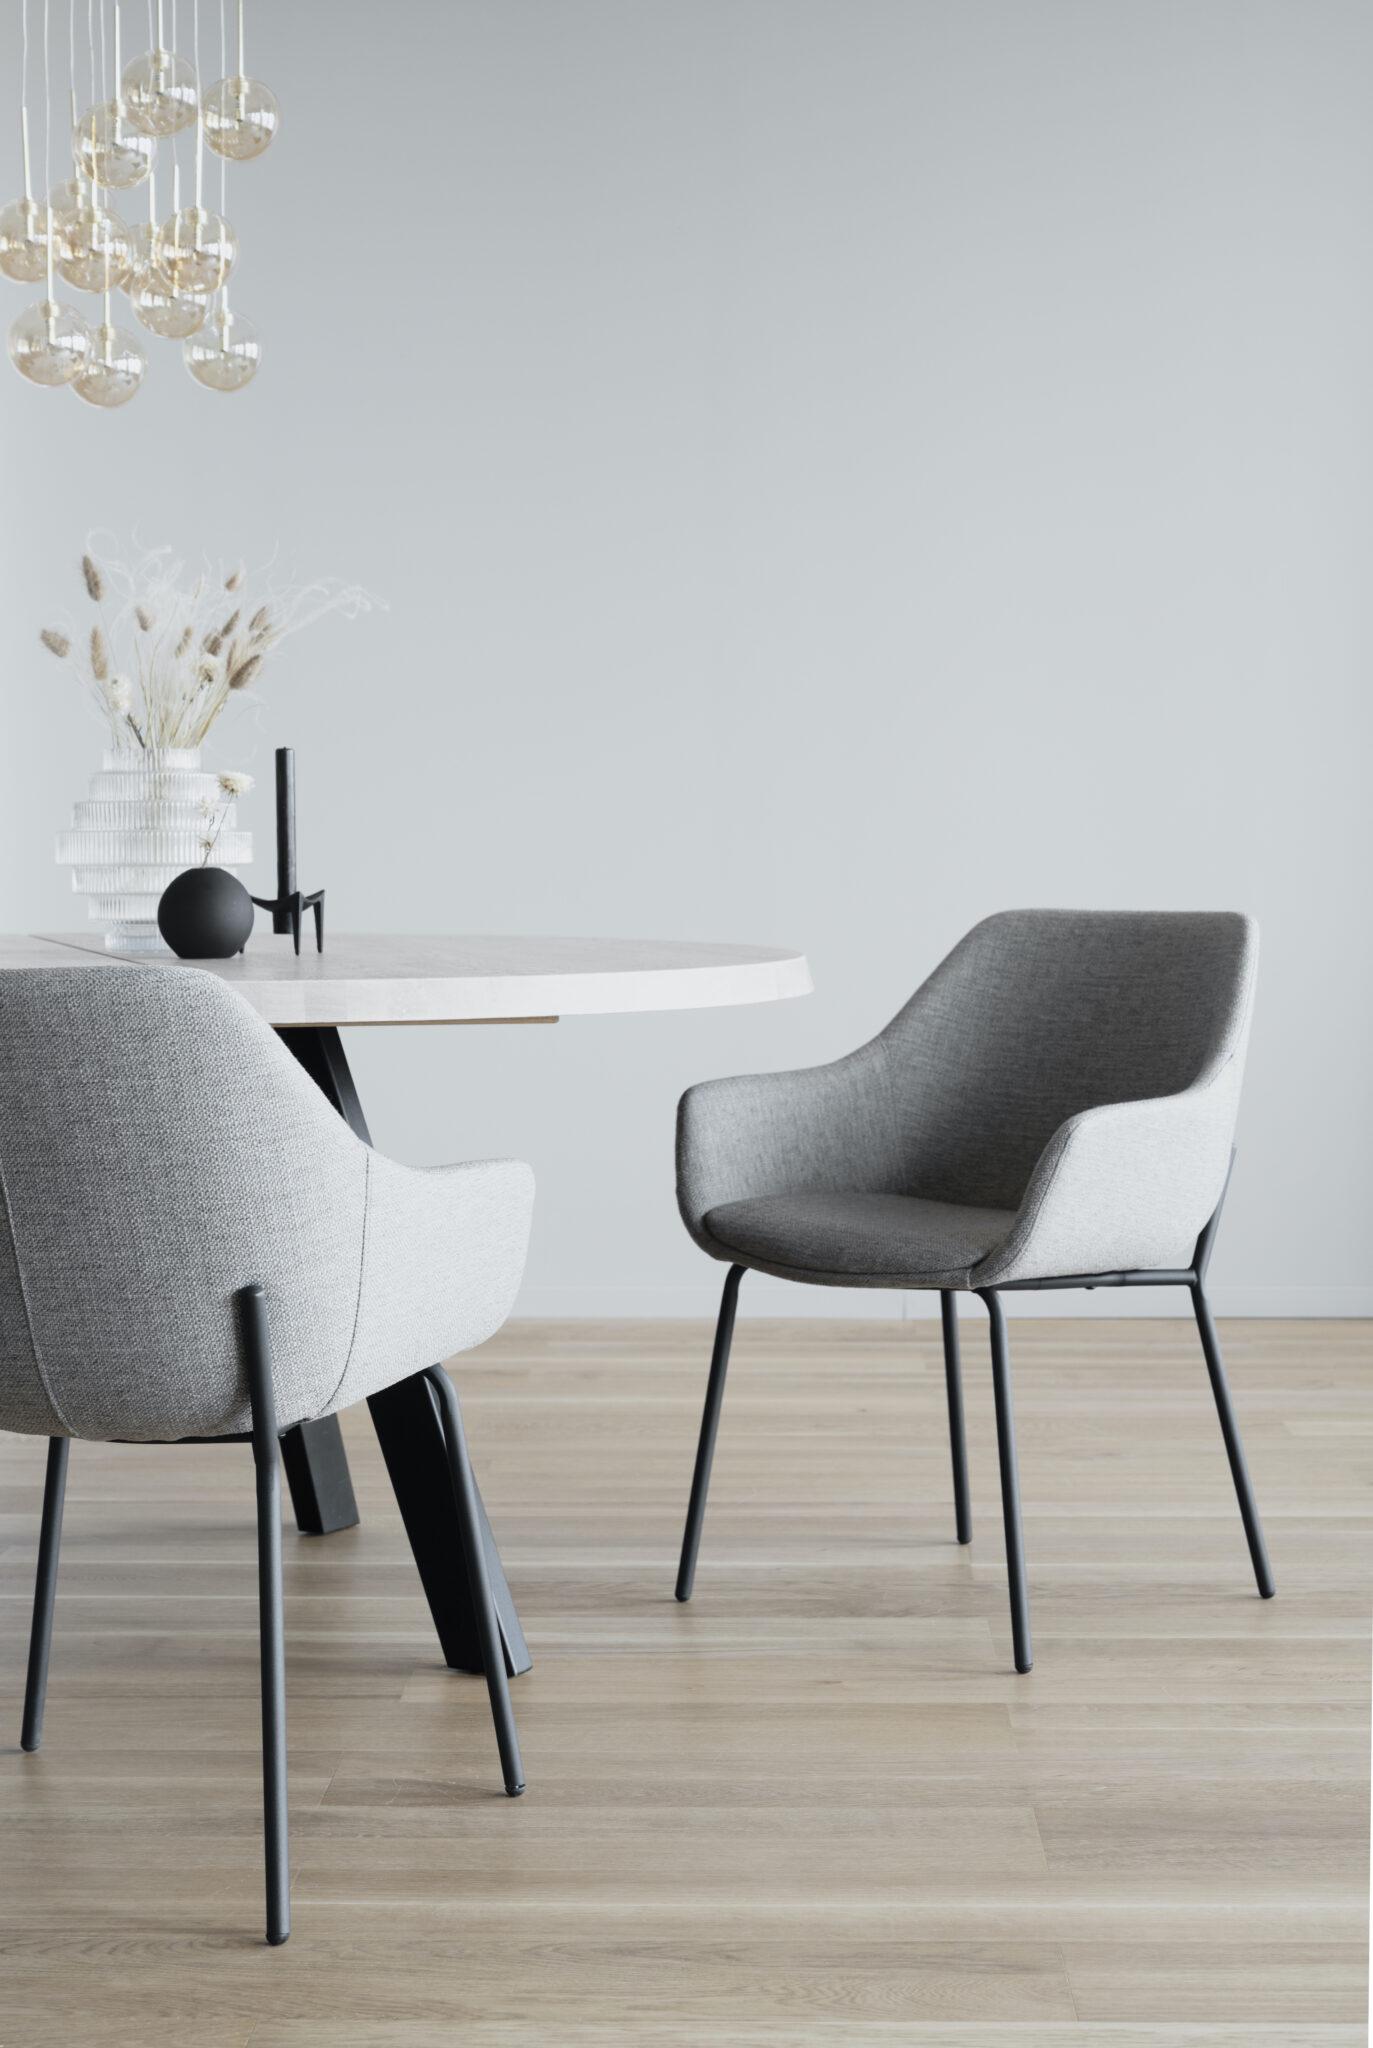 Haley arm chair Light grey_black 110480 7